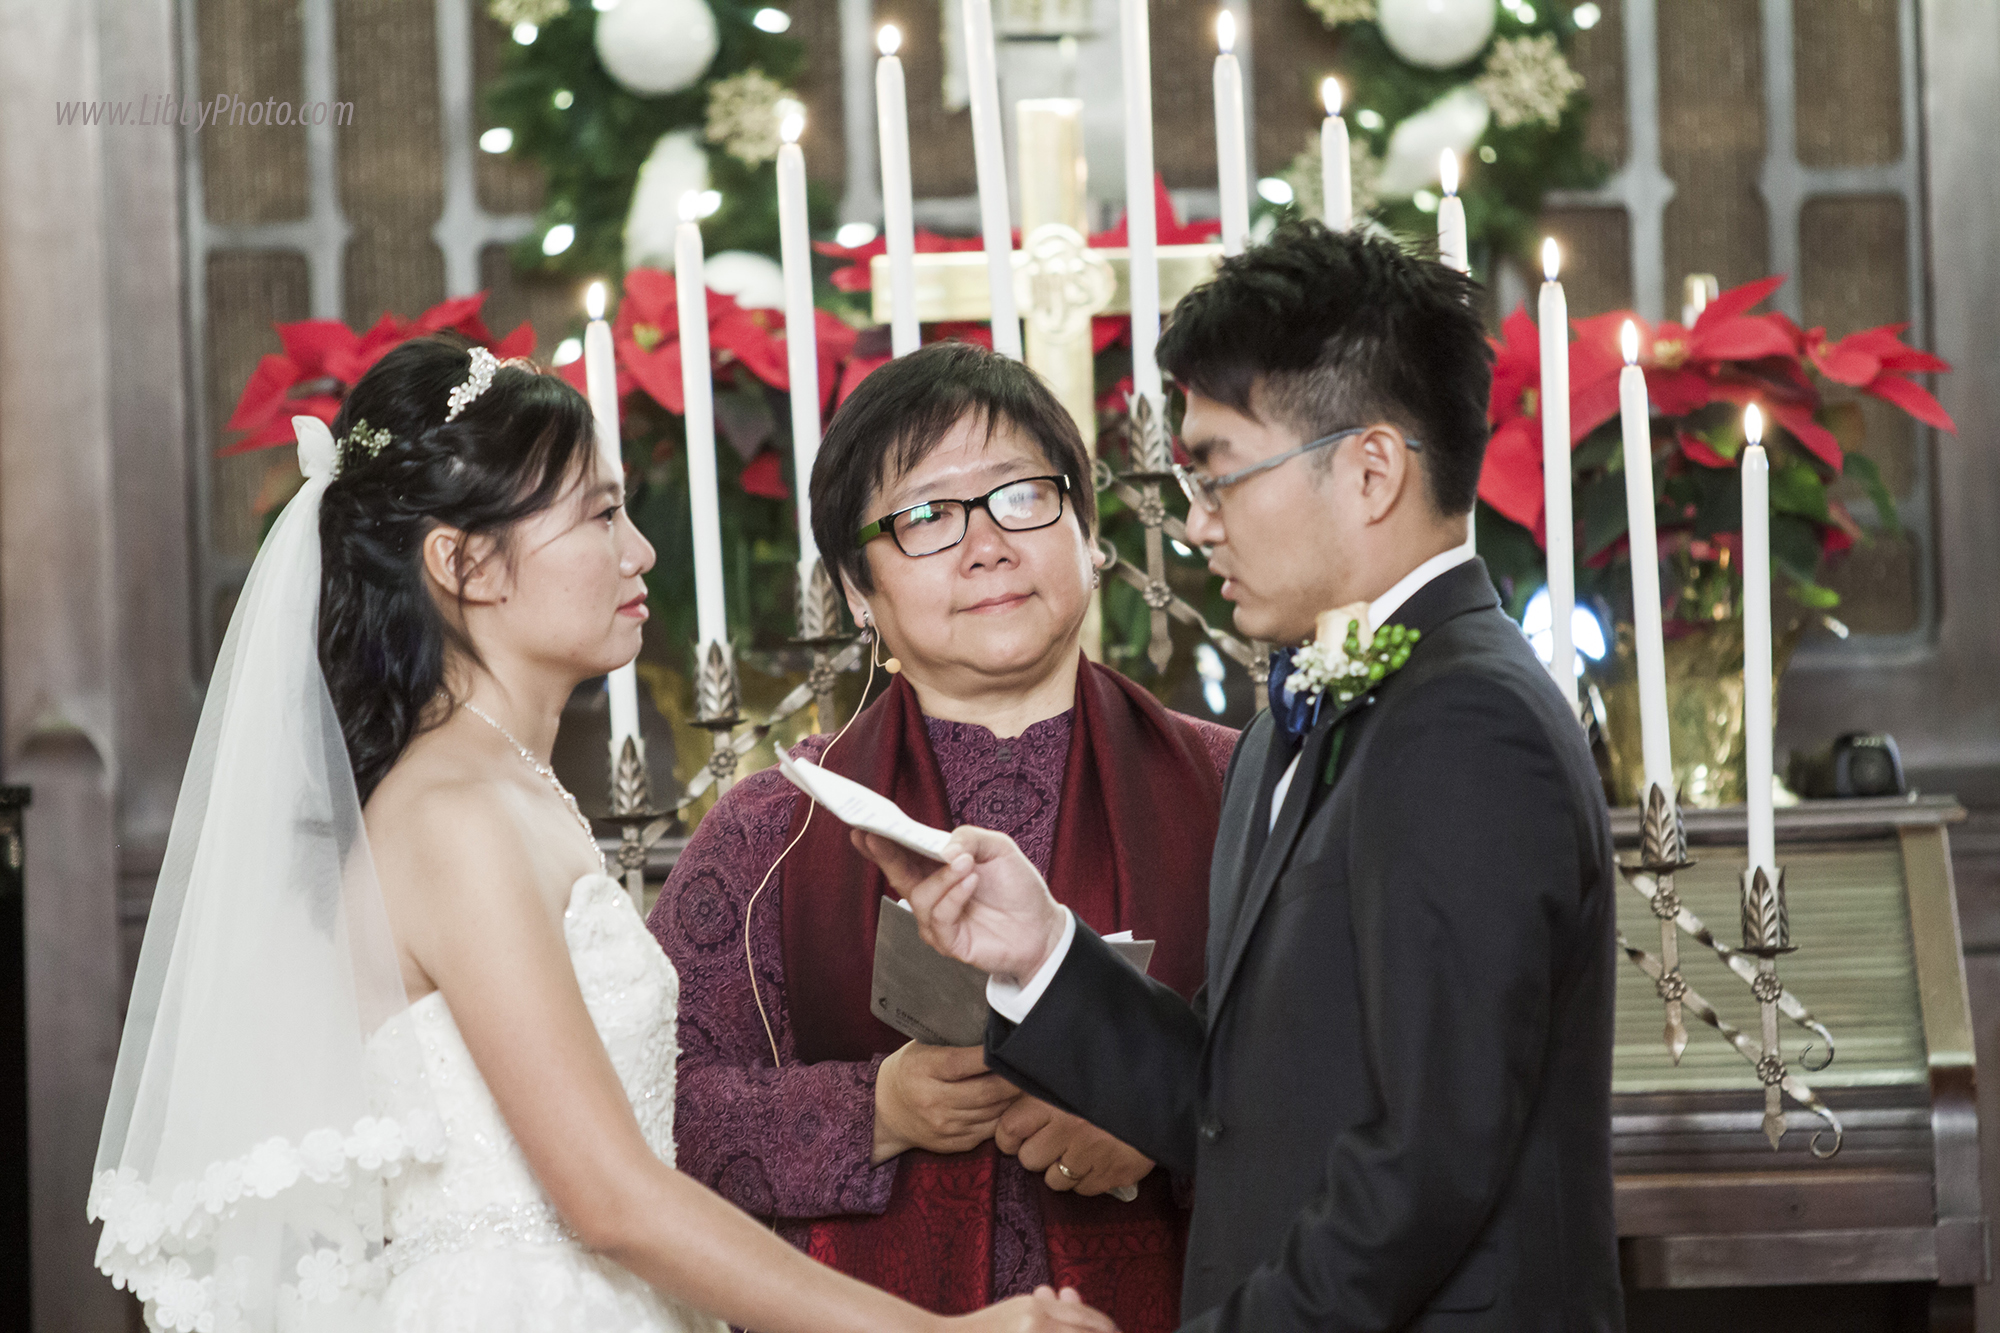 Atlanta wedding photography Libbyphoto (30).jpg